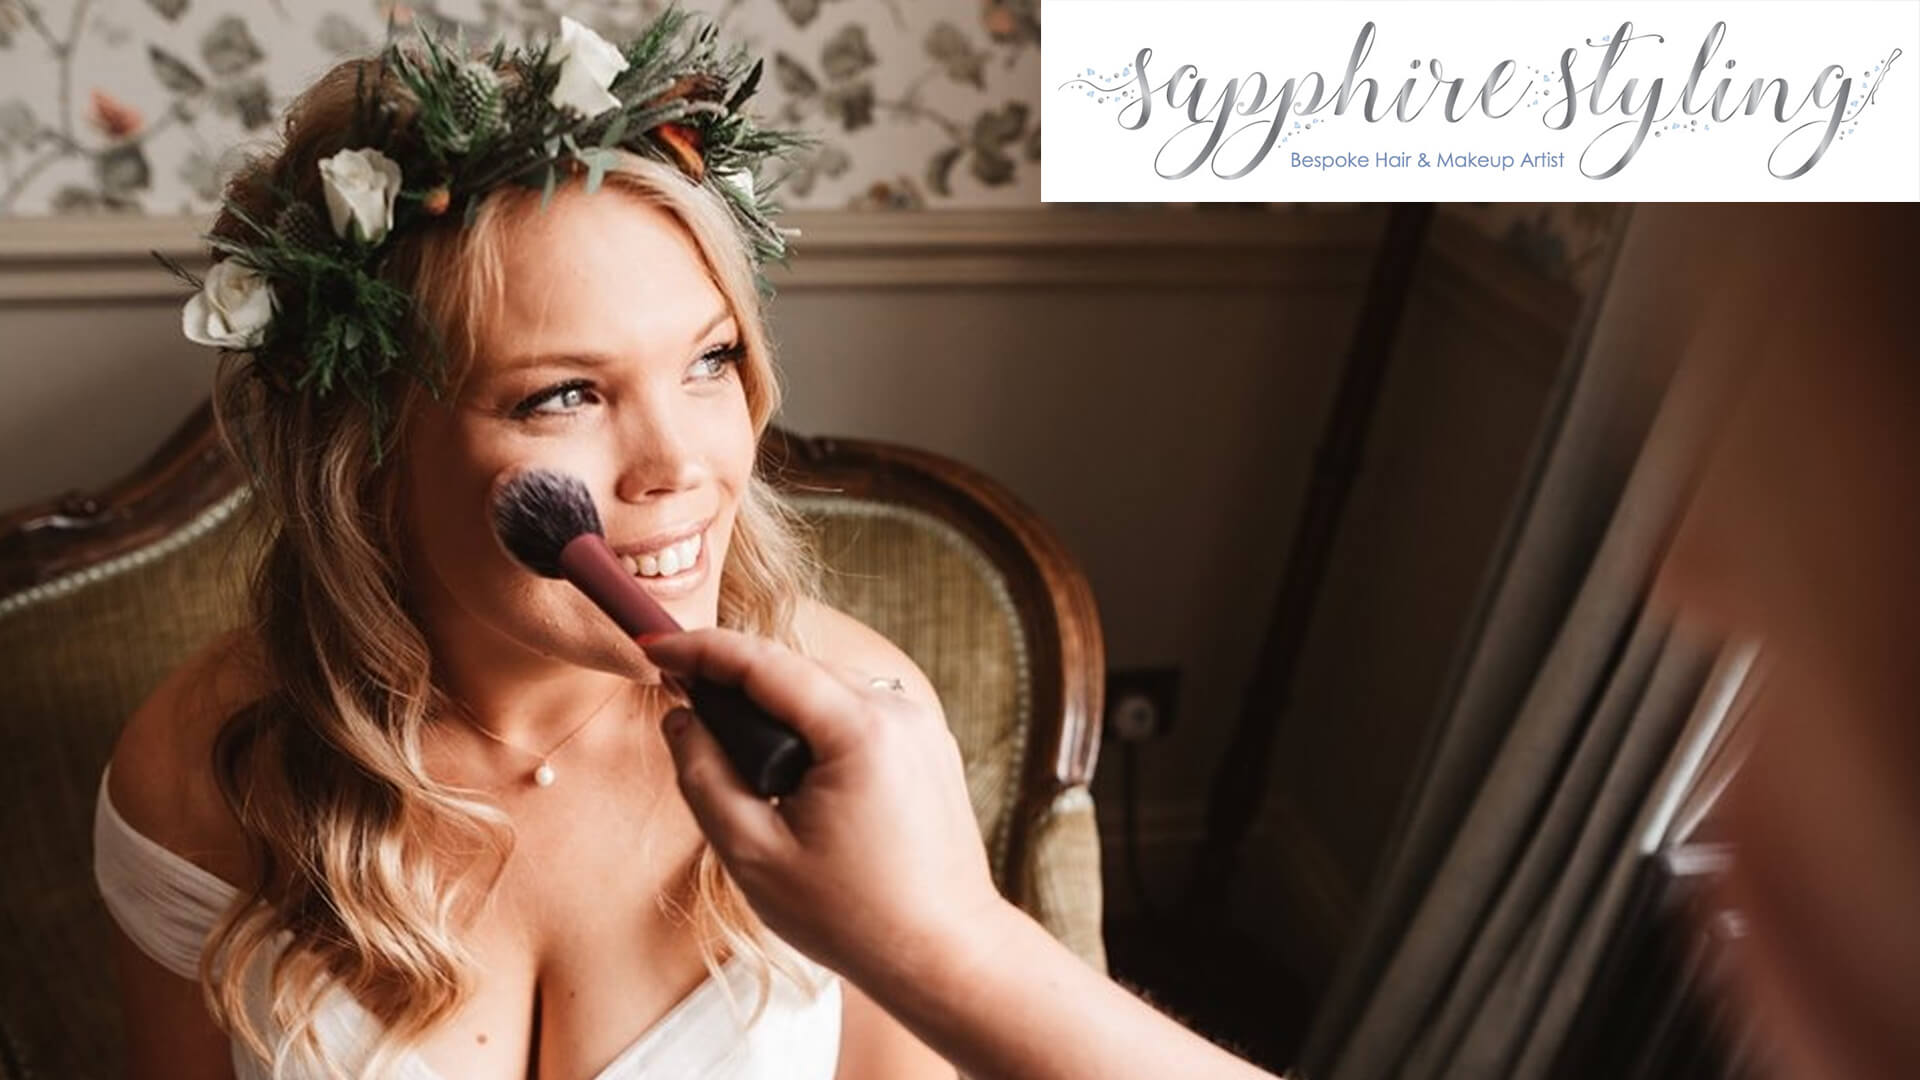 Sapphire Styling